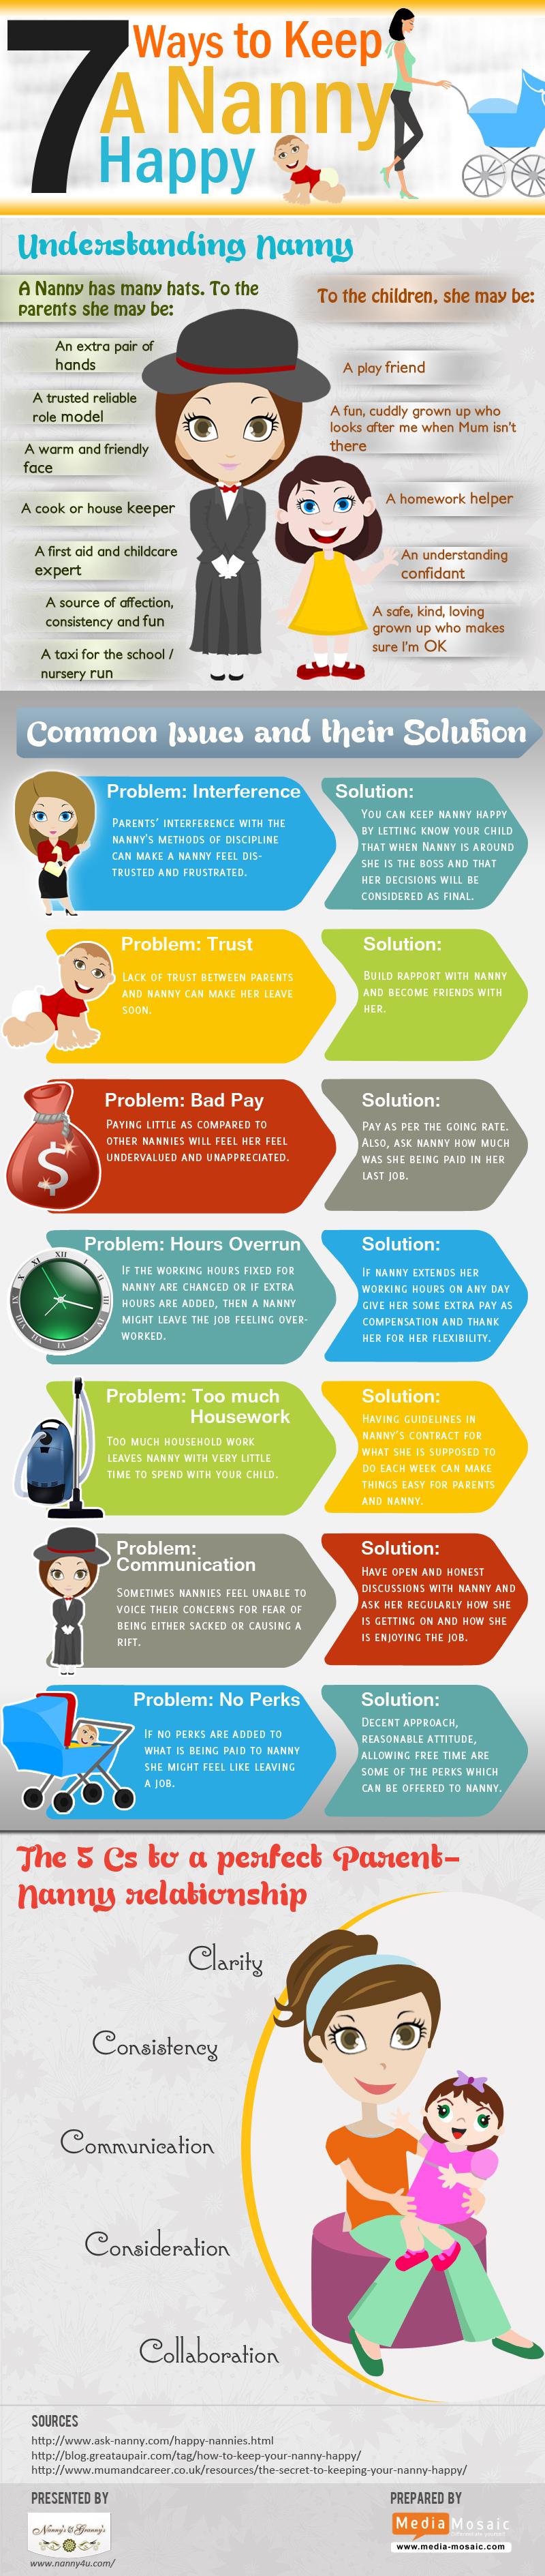 7-Ways-to-Keep-a-Nanny-Happy-Infographic-by-Nanny4u